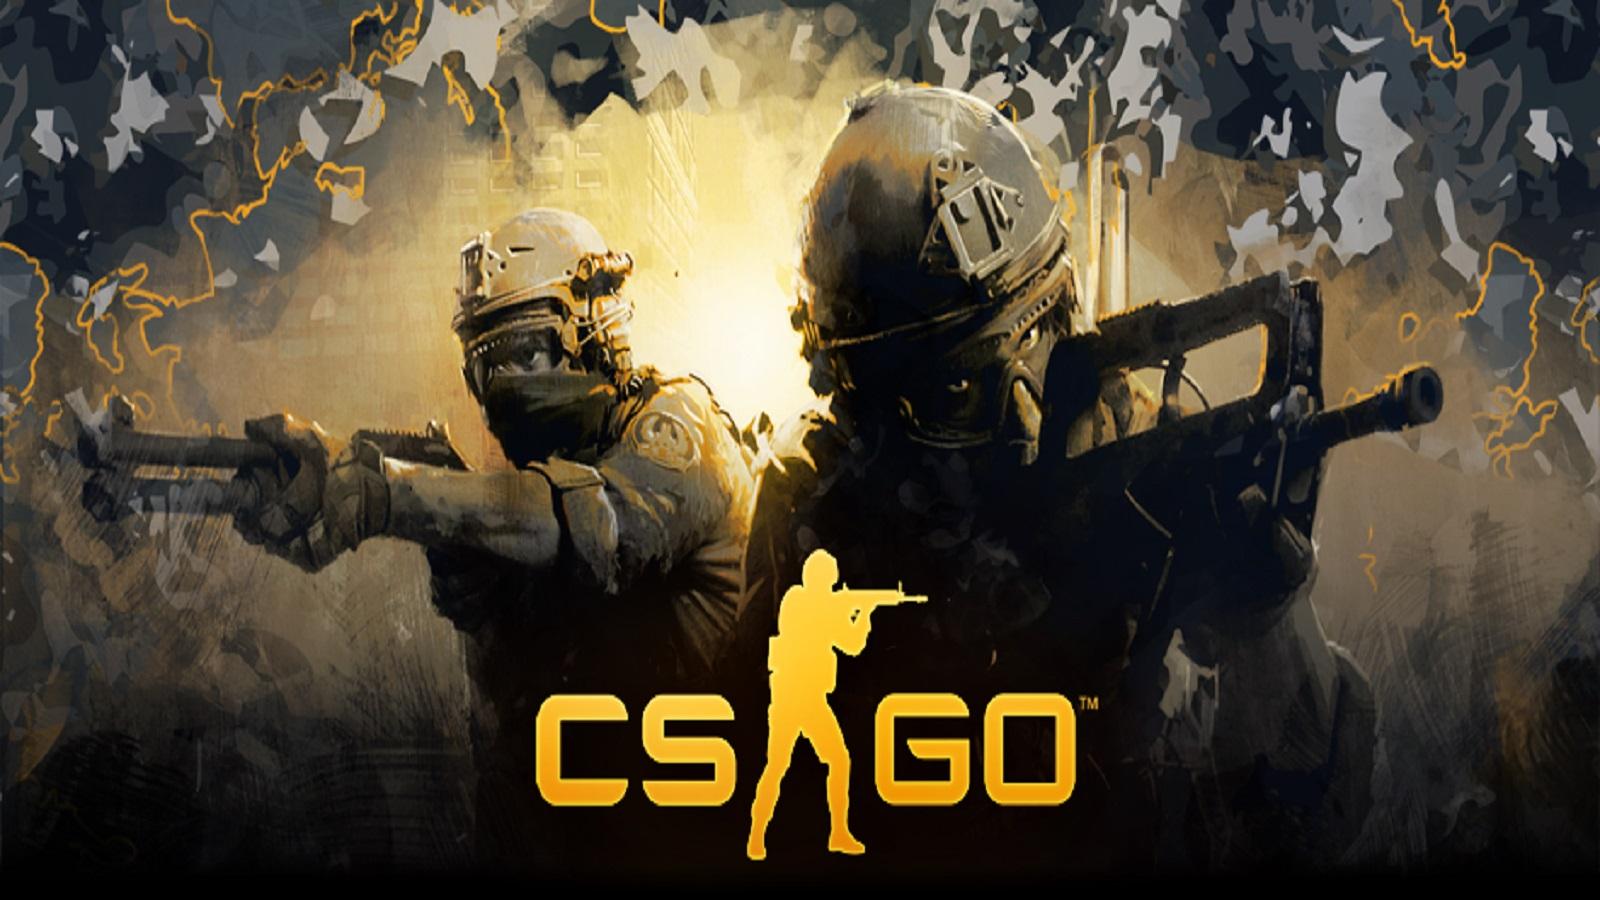 CSGO Skin Gambling Boom – Brash Games